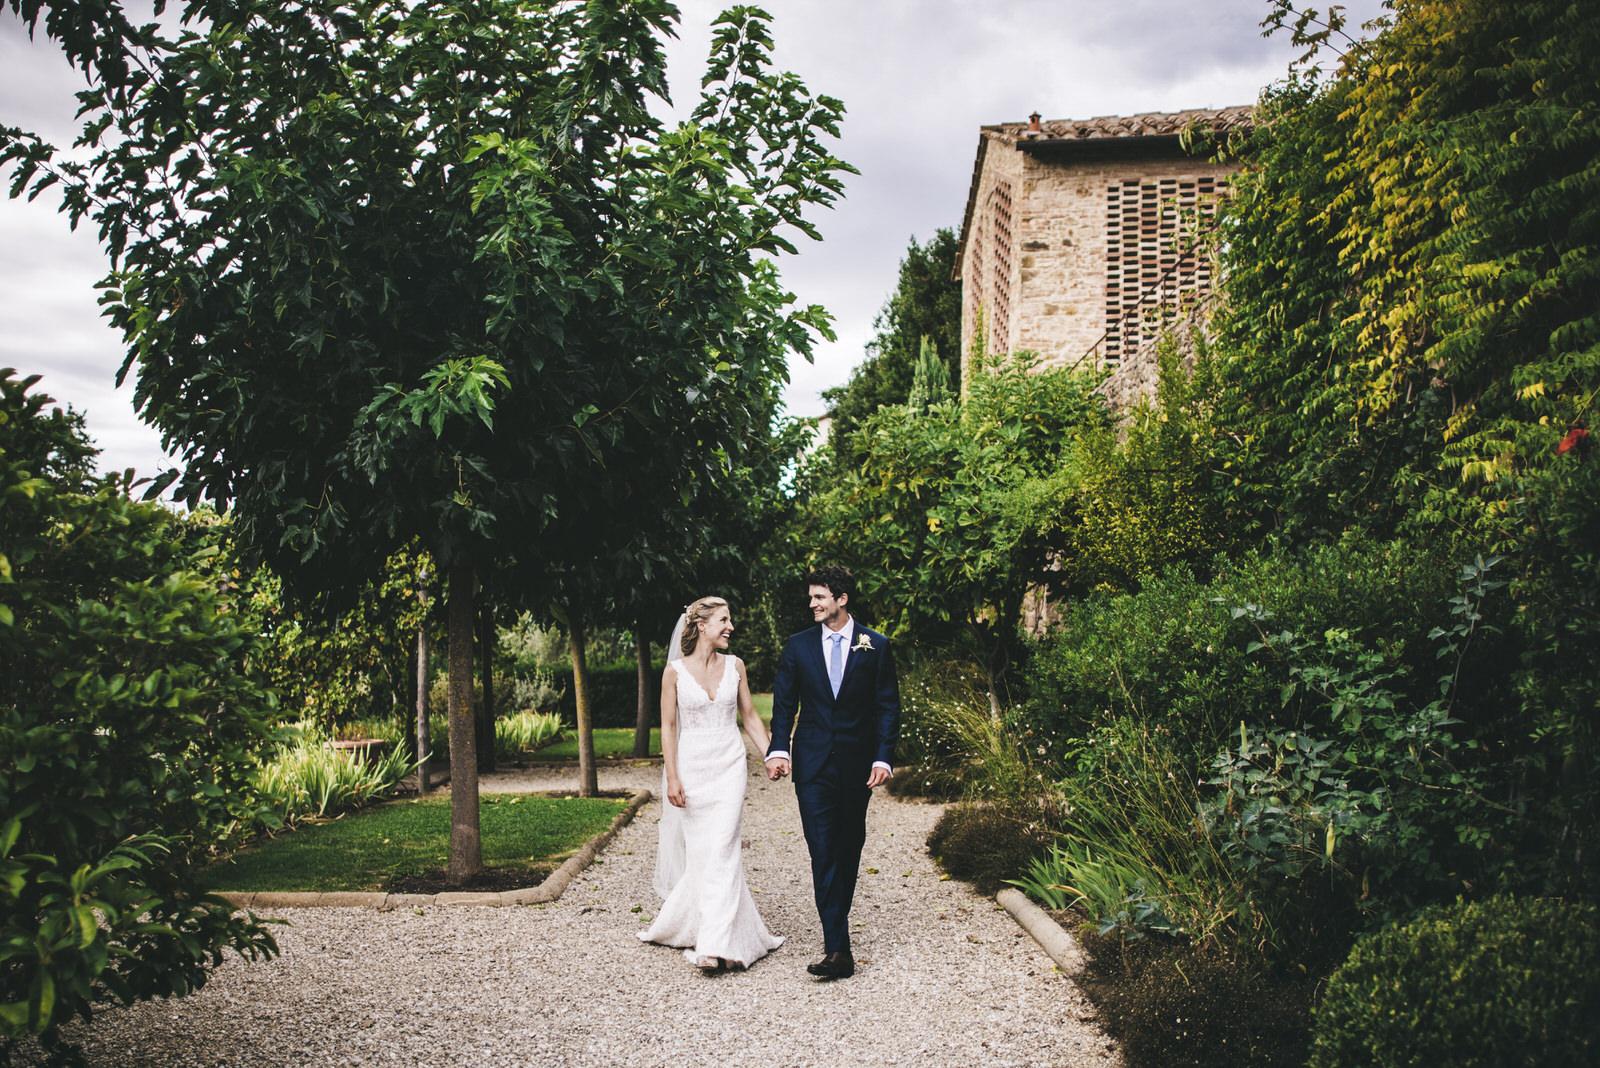 wedding photographer in italy-venice-tuscany-florence-amalfi coast-como lake-villa del balbianello-siena-amalfi-ravello-belmond-villa cimbrone34